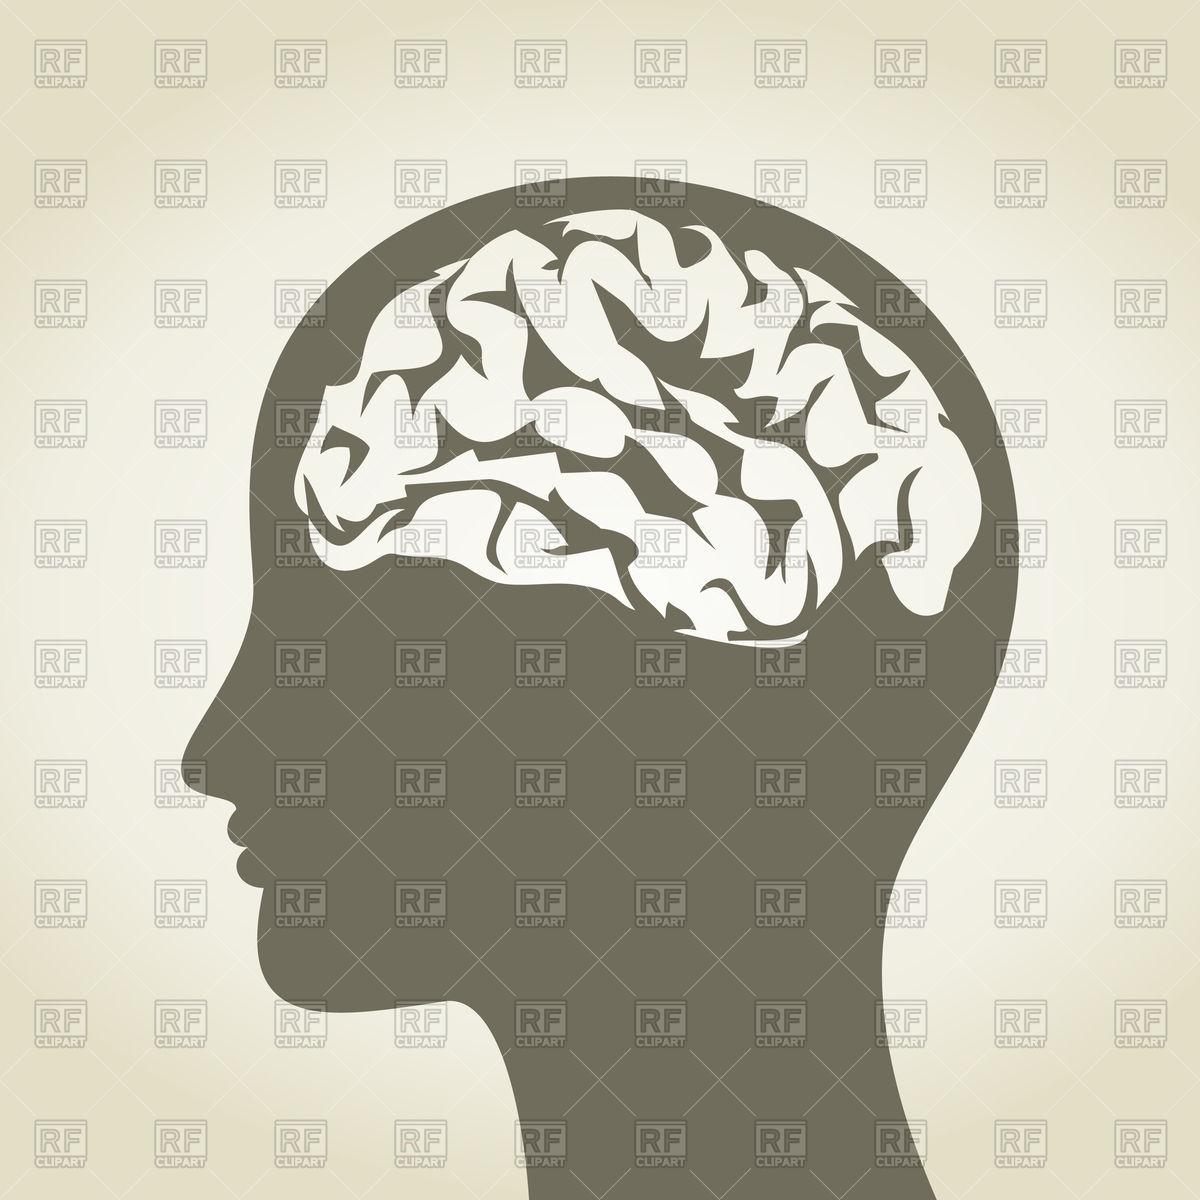 brain in head clipart - photo #21